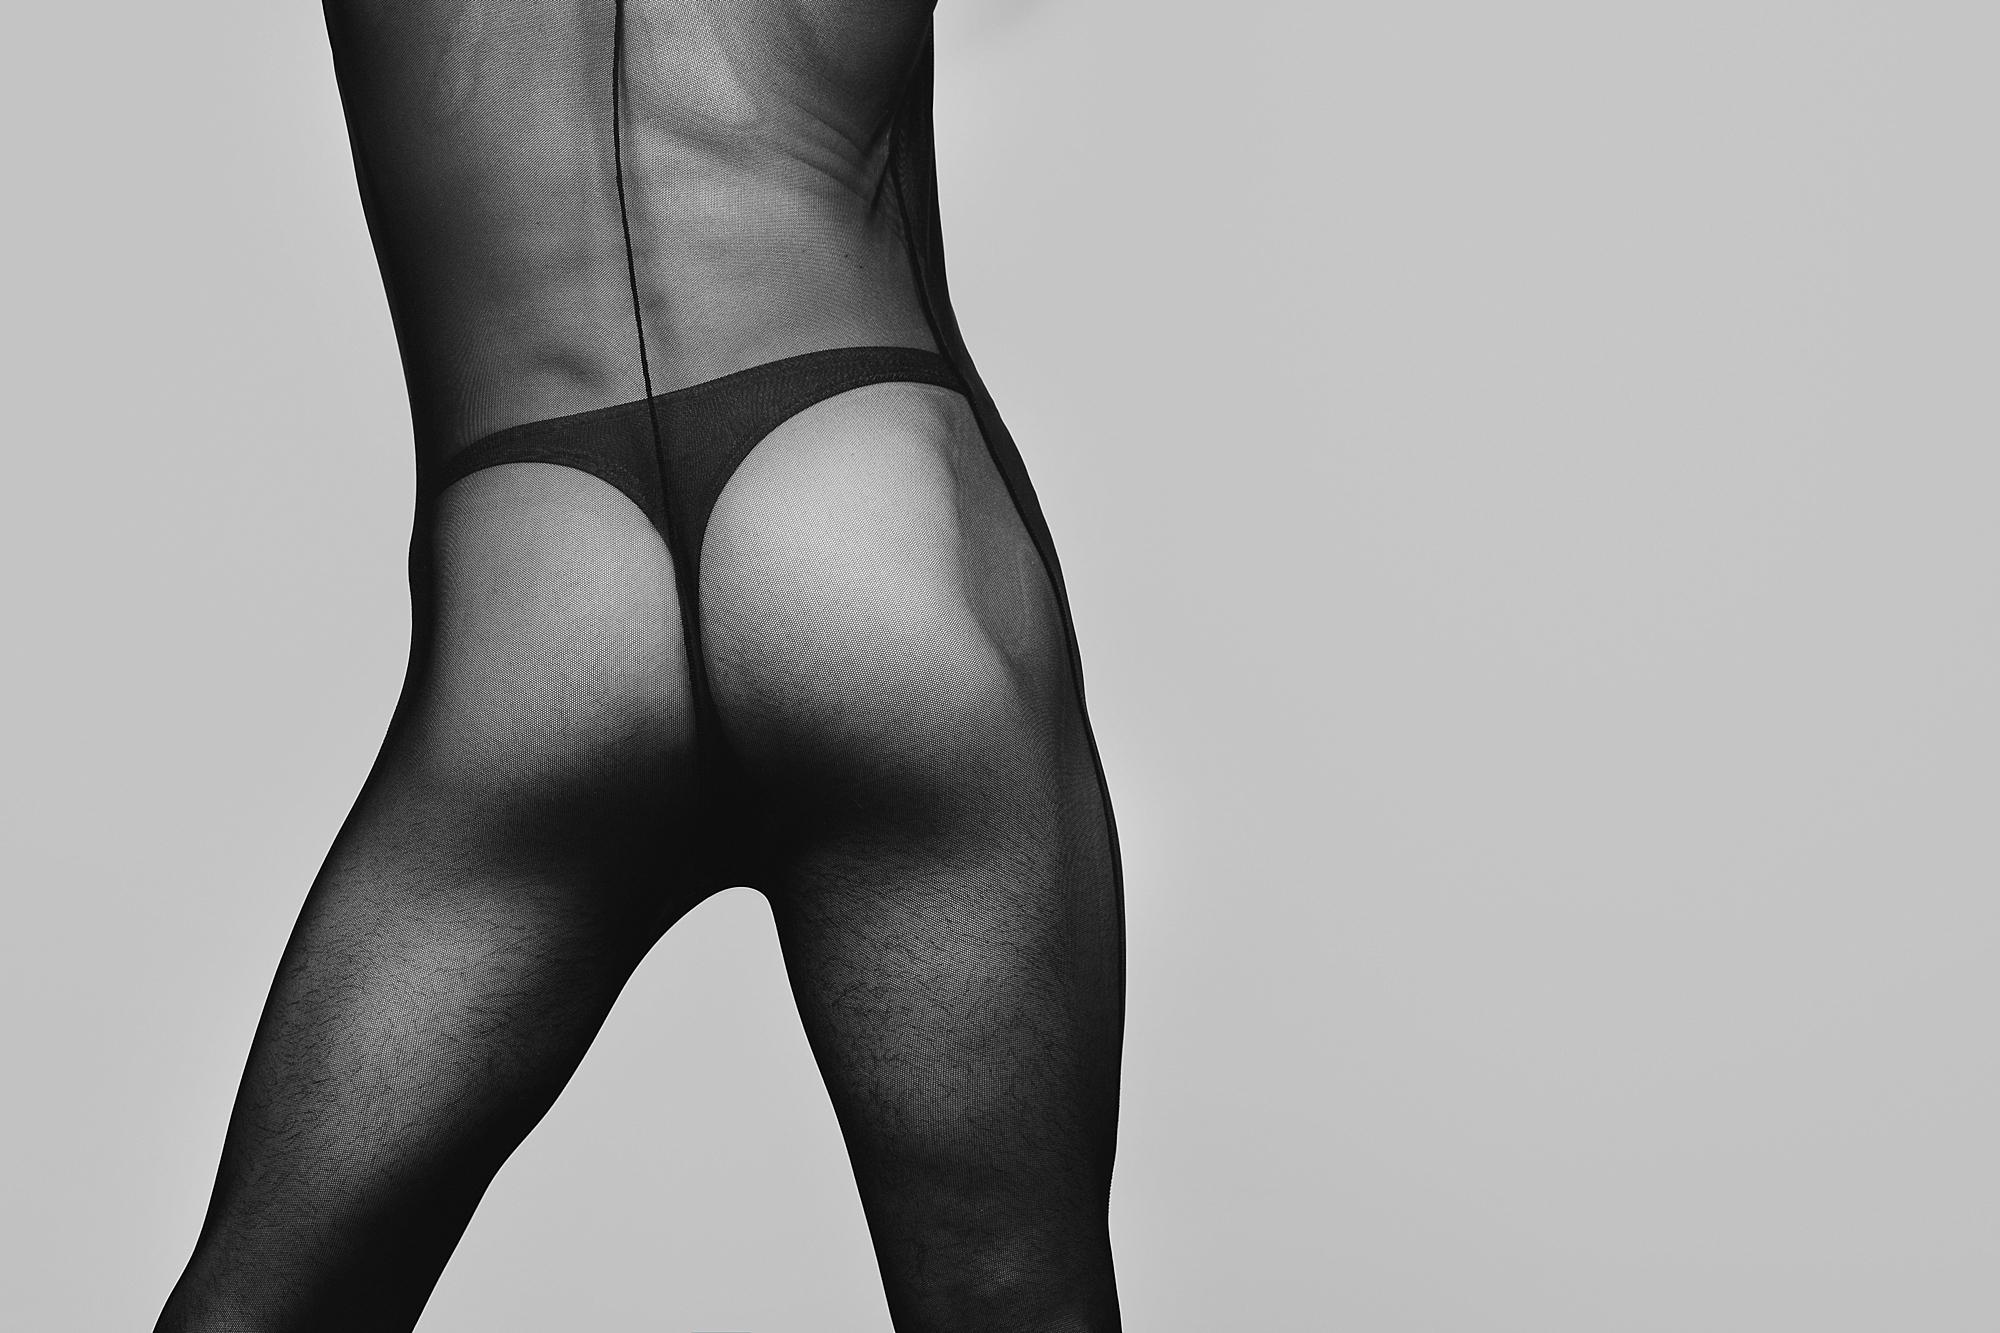 Joe_Mac_Creative_Joey_Arrigo_Philadelphia_Gay_Fashion_Photography__0014.jpg